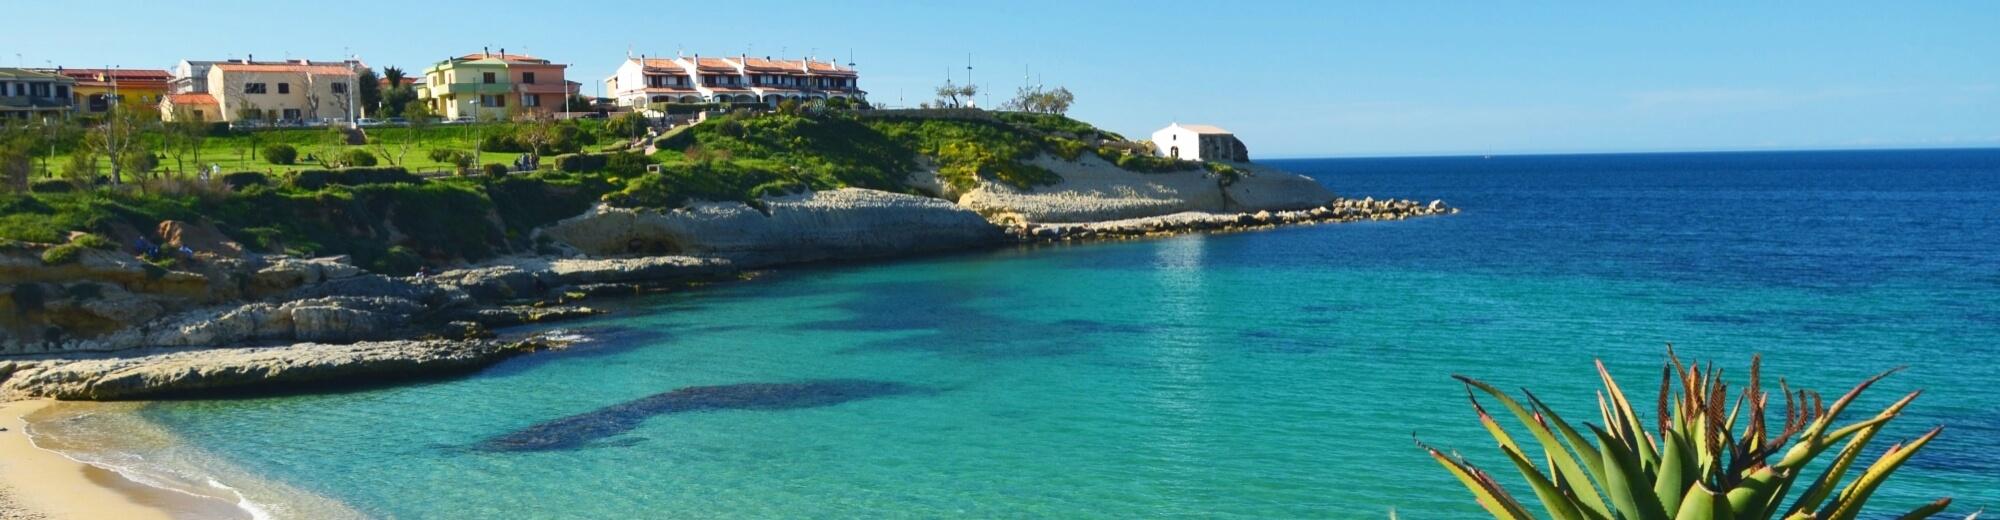 Spiaggia di Balai a Porto Torres